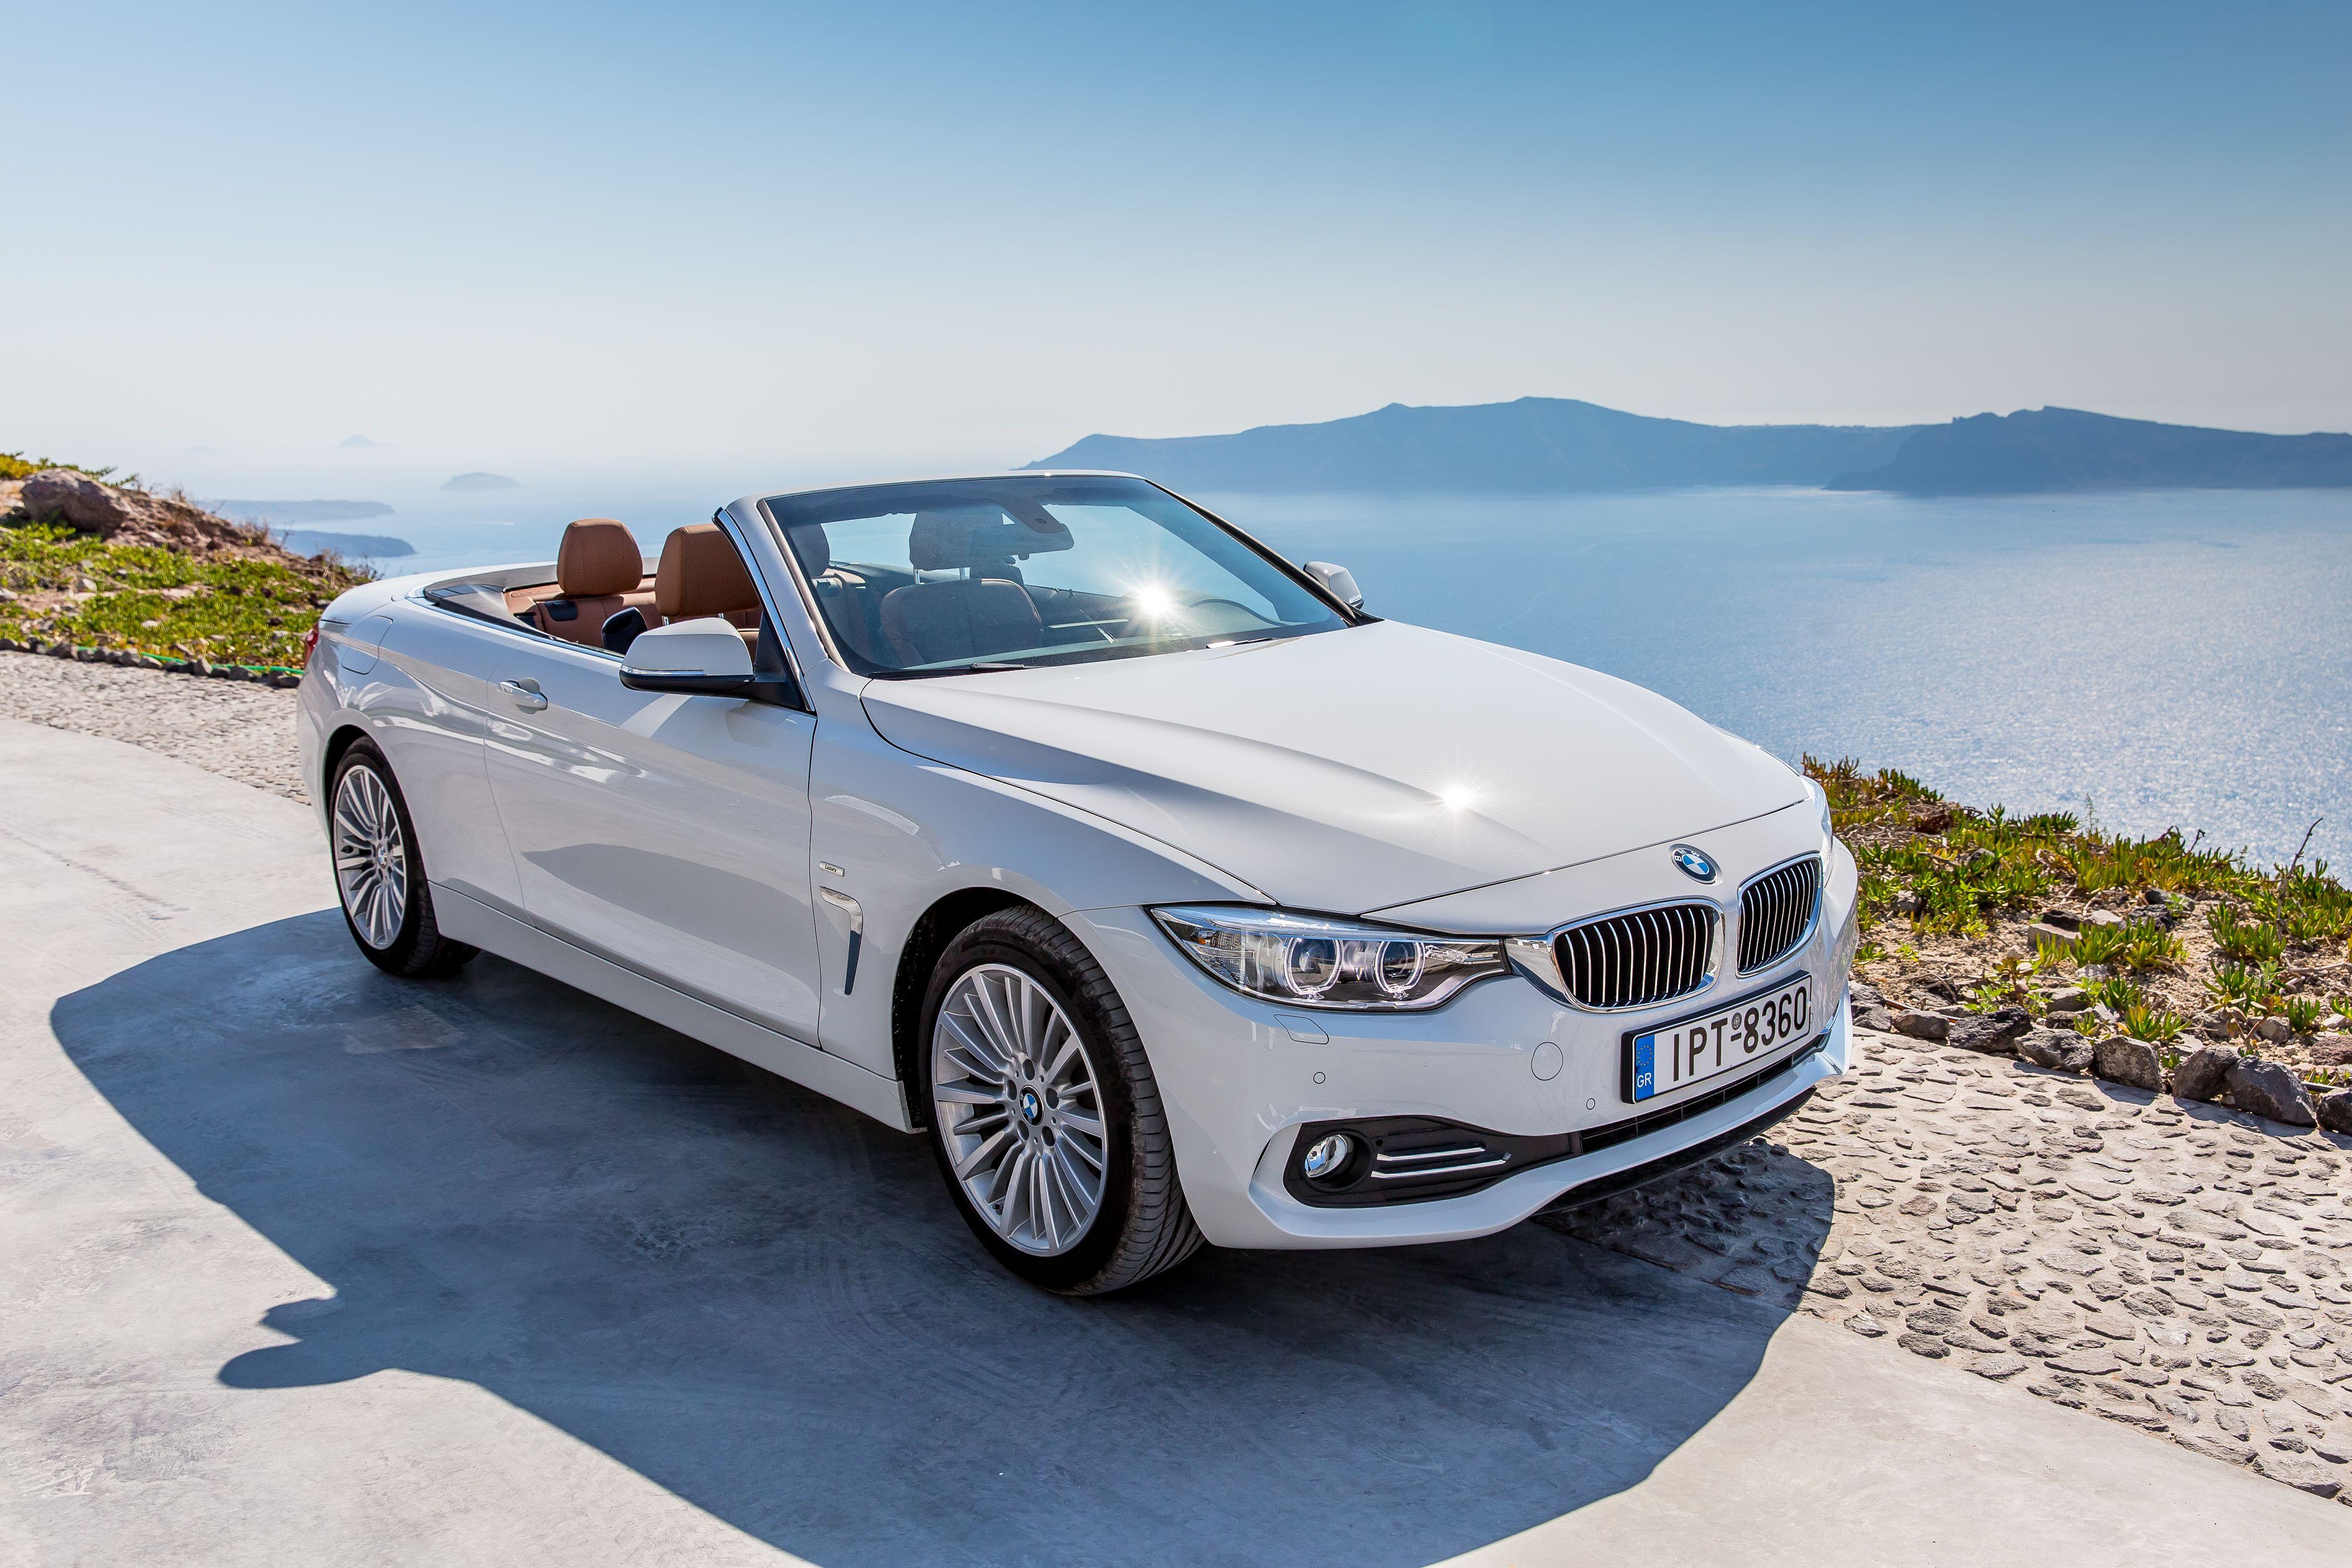 Luxury BMW 420D Convertible Sunny Santorini Luxury Cars